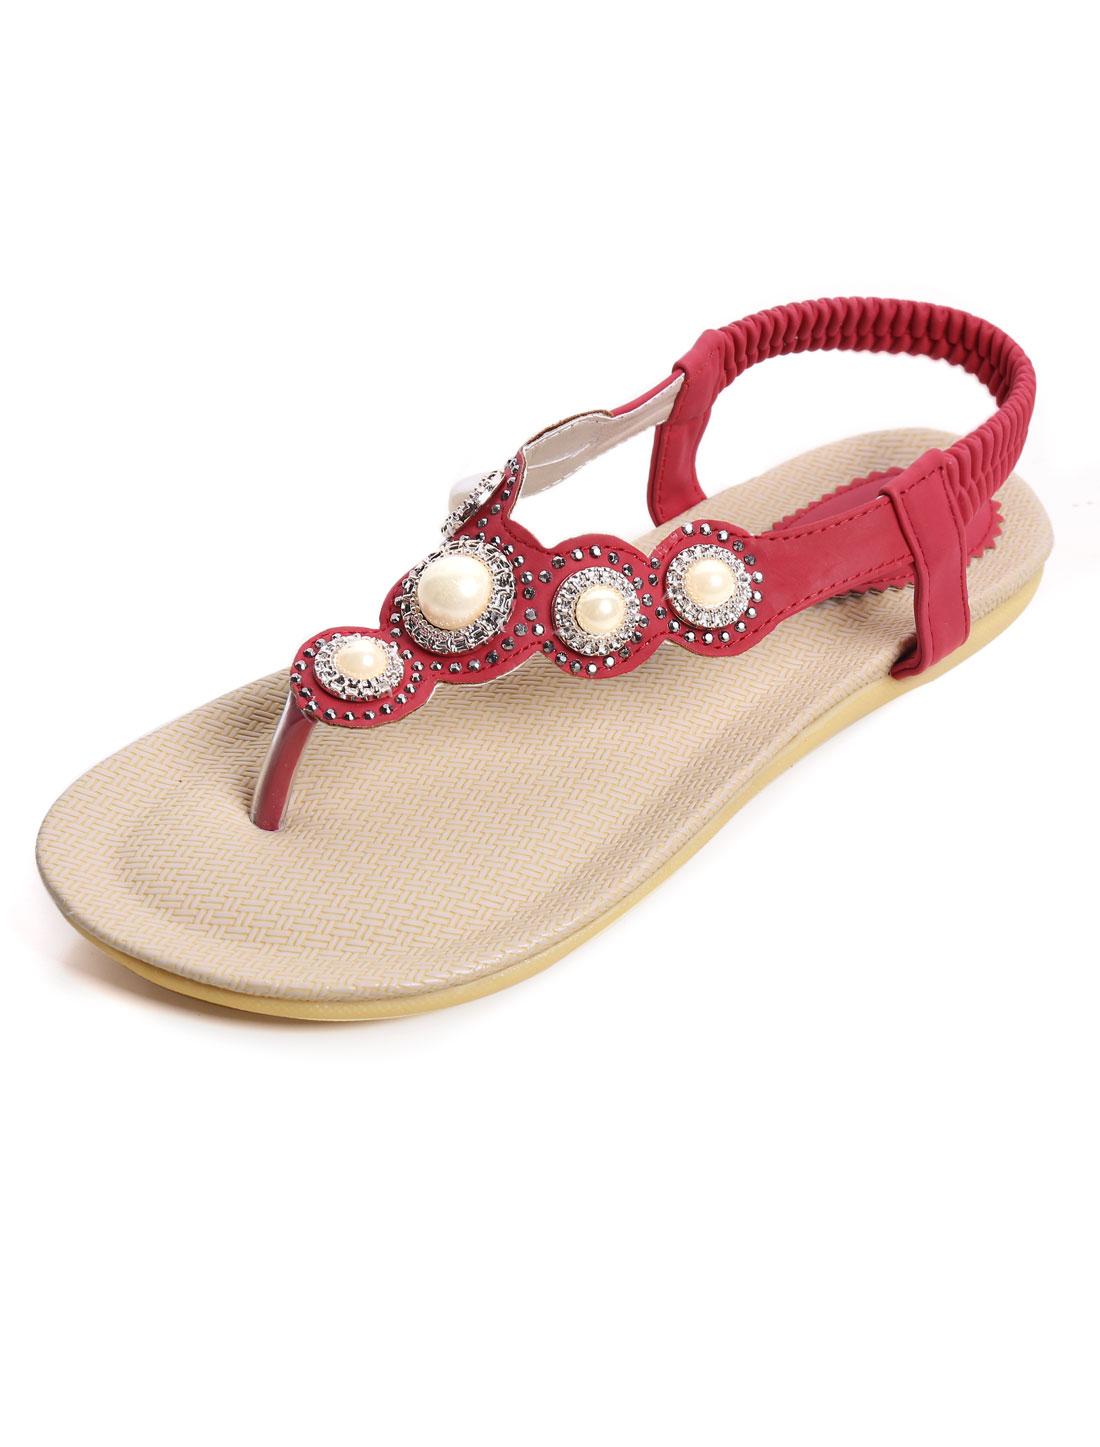 Woman Rhinestones Embellished Elastic Ankle Strap Sandals Red US 7